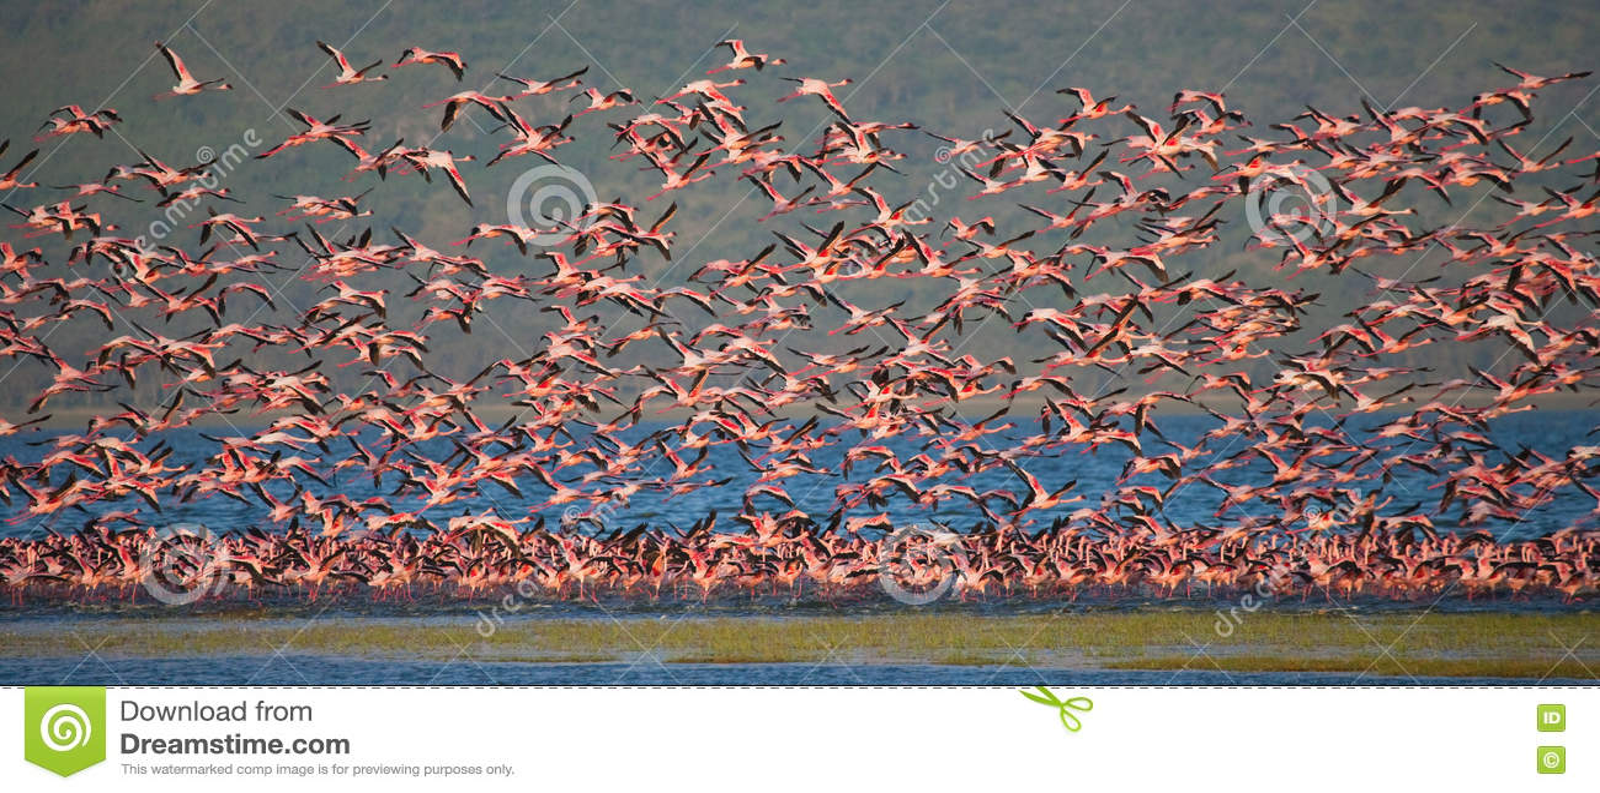 Enorm flock av flamingo som tar av kenya _ Nakuru National Park SjöBogoria nationell reserv